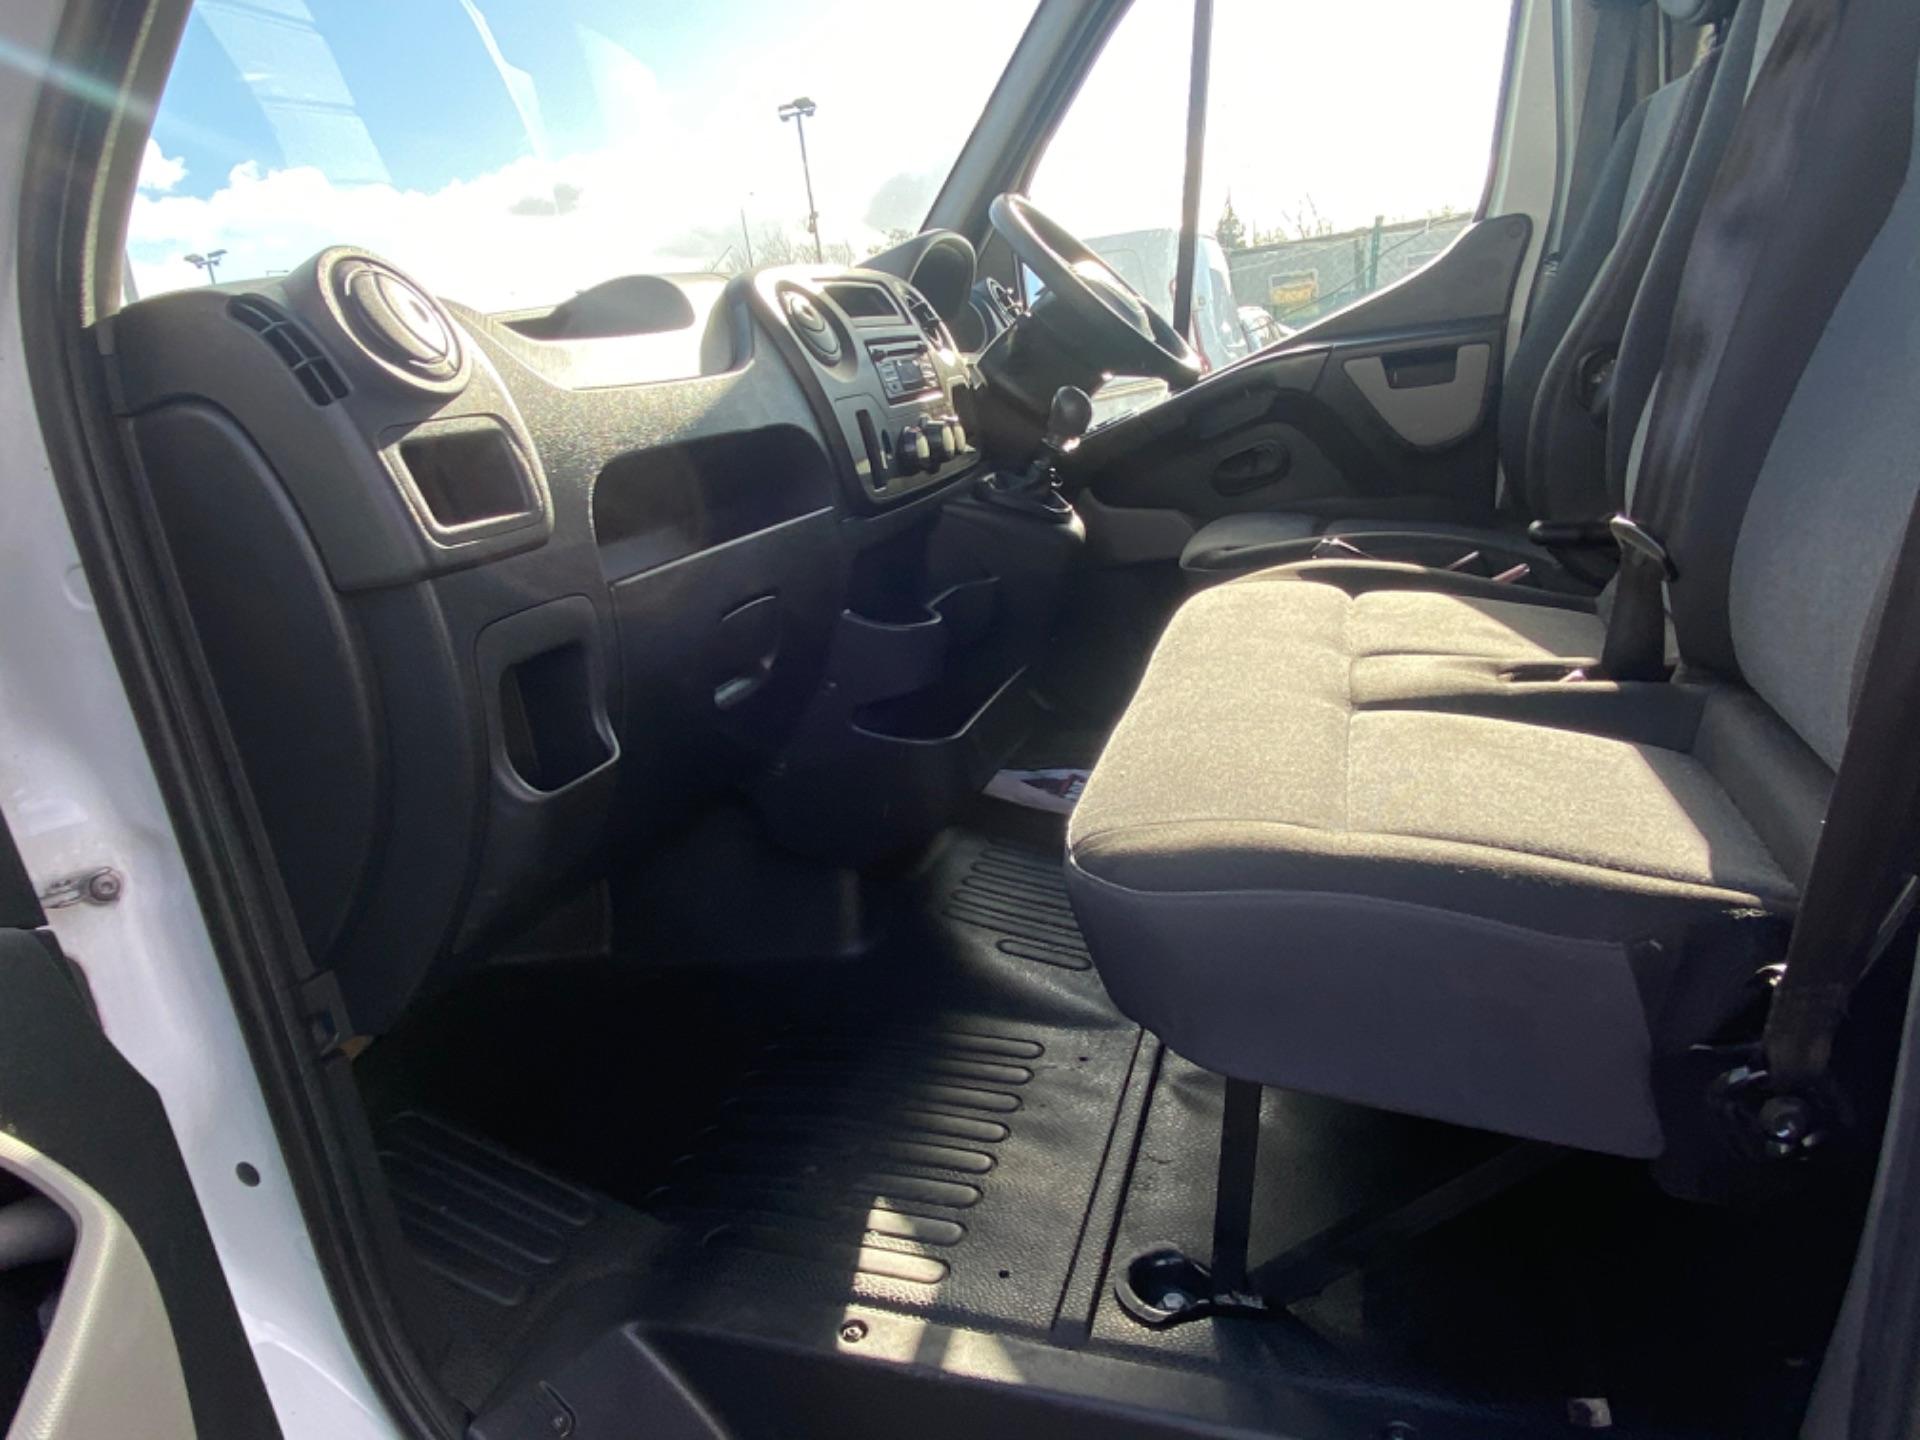 2017 Renault Master FWD LM35 DCI 125 Business 3DR (171D17814) Image 11